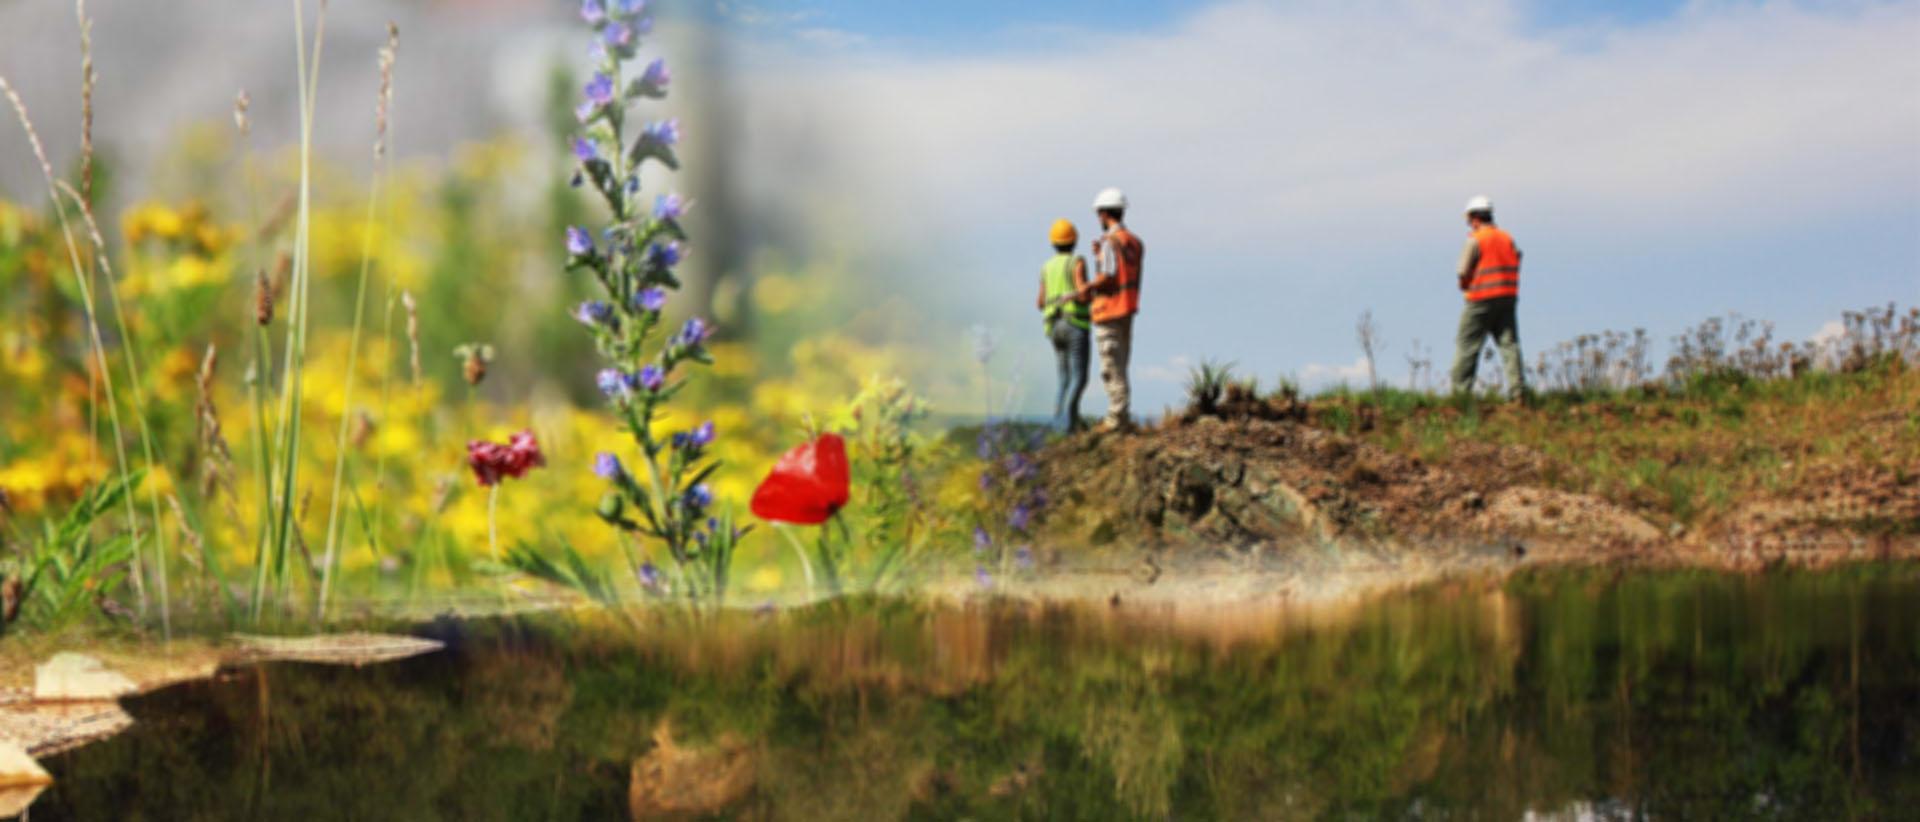 Biolandscape – Biodiversity, where you do not expect it!